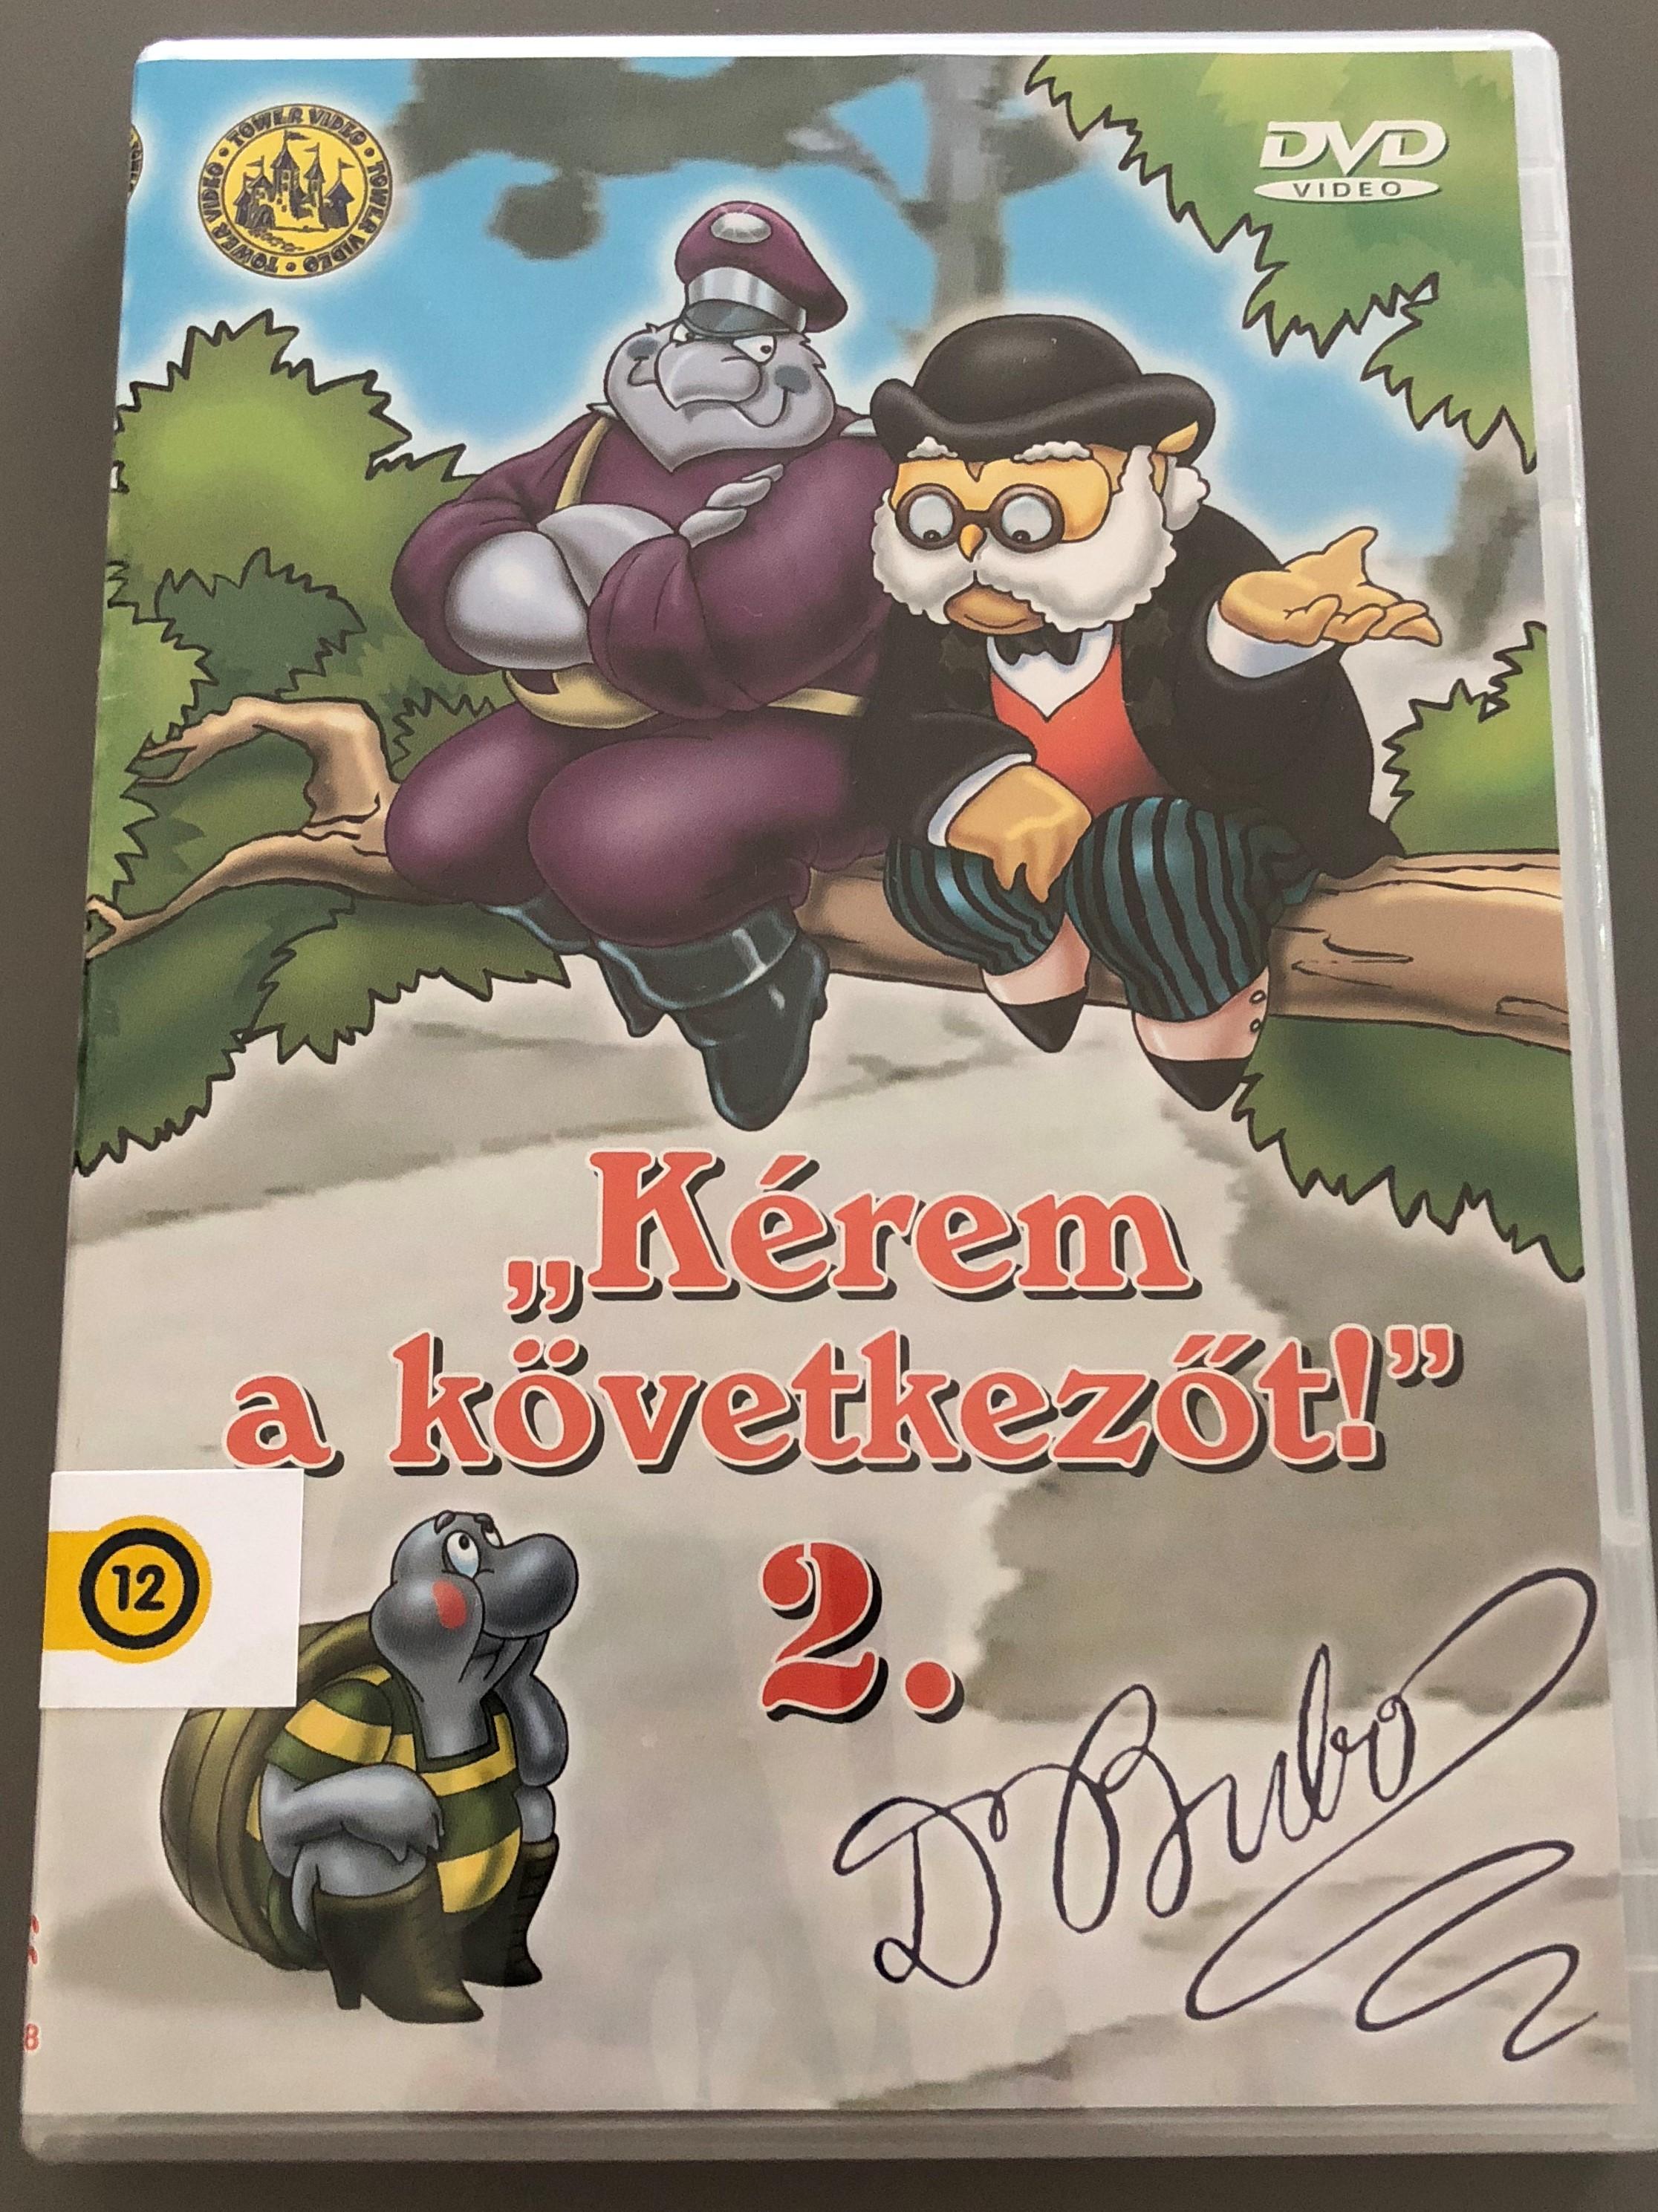 k-rem-a-k-vetkez-t-2.-dvd-1974-hungarian-cartoon-tv-series-written-by-rohm-nyi-j-zsef-directed-by-nepp-j-zsef-ternovszky-b-la-1-.jpg